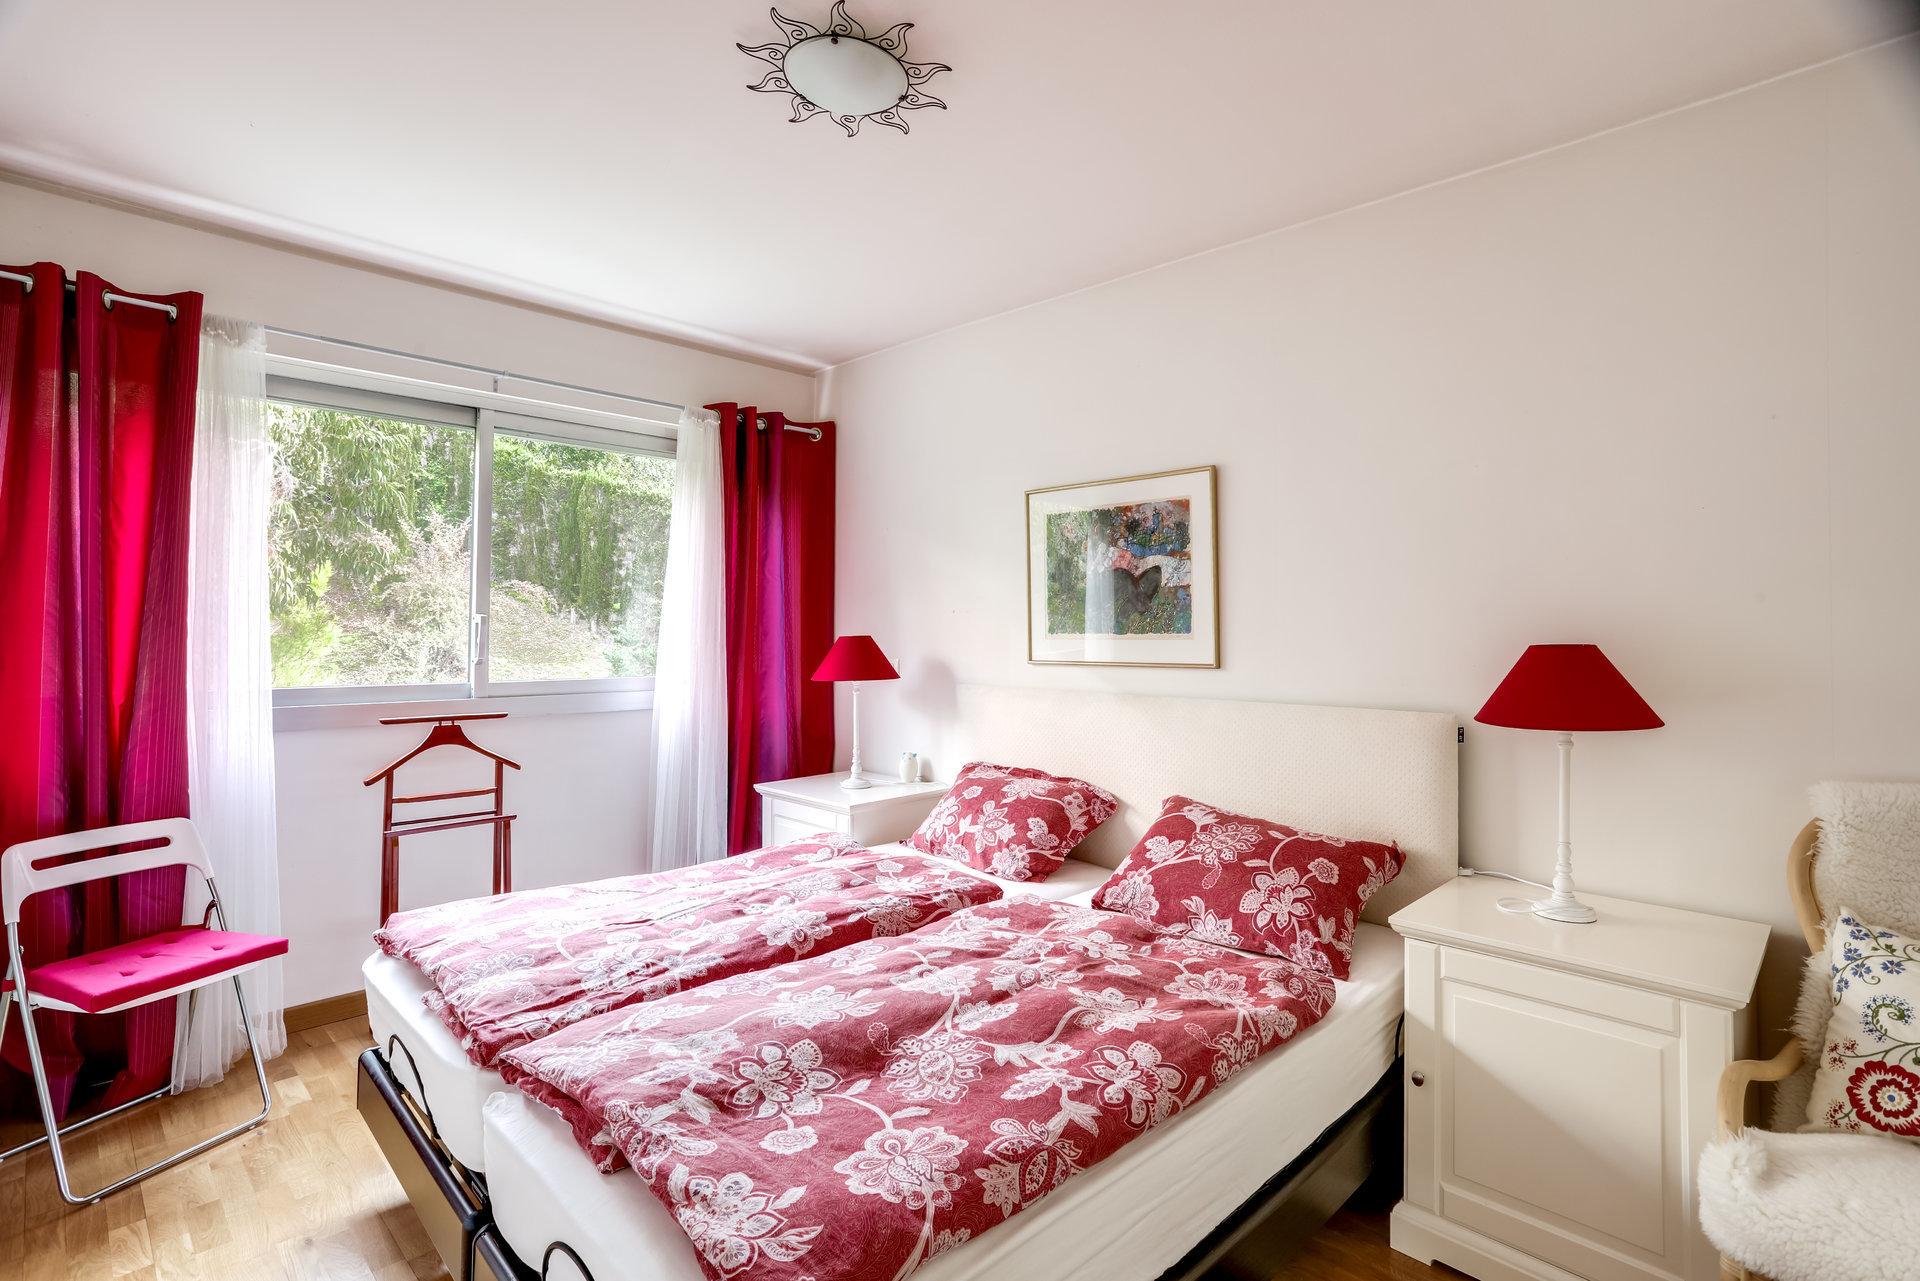 ANTIBES Badine - Grand appartement avec terrasse et vue mer